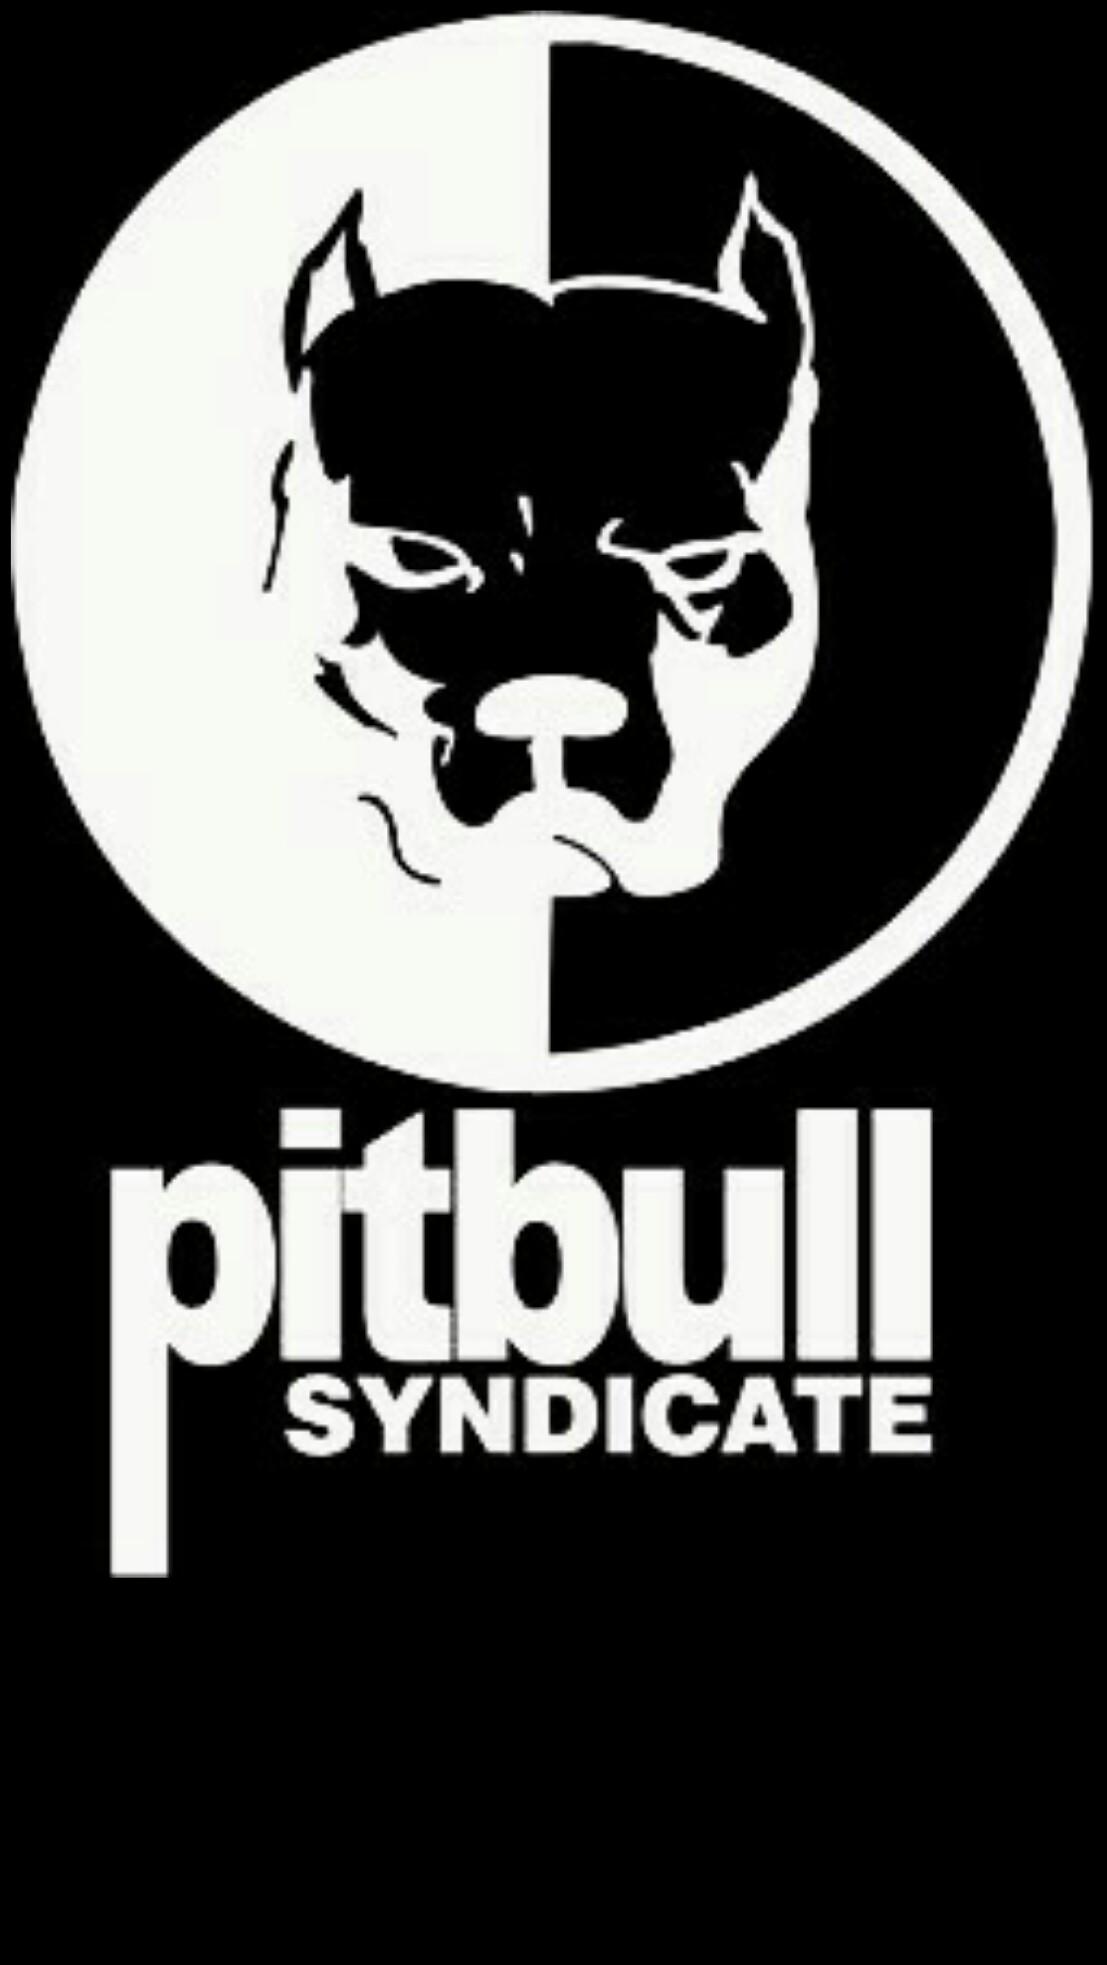 #pitbull #black #wallpaper #android #iphone